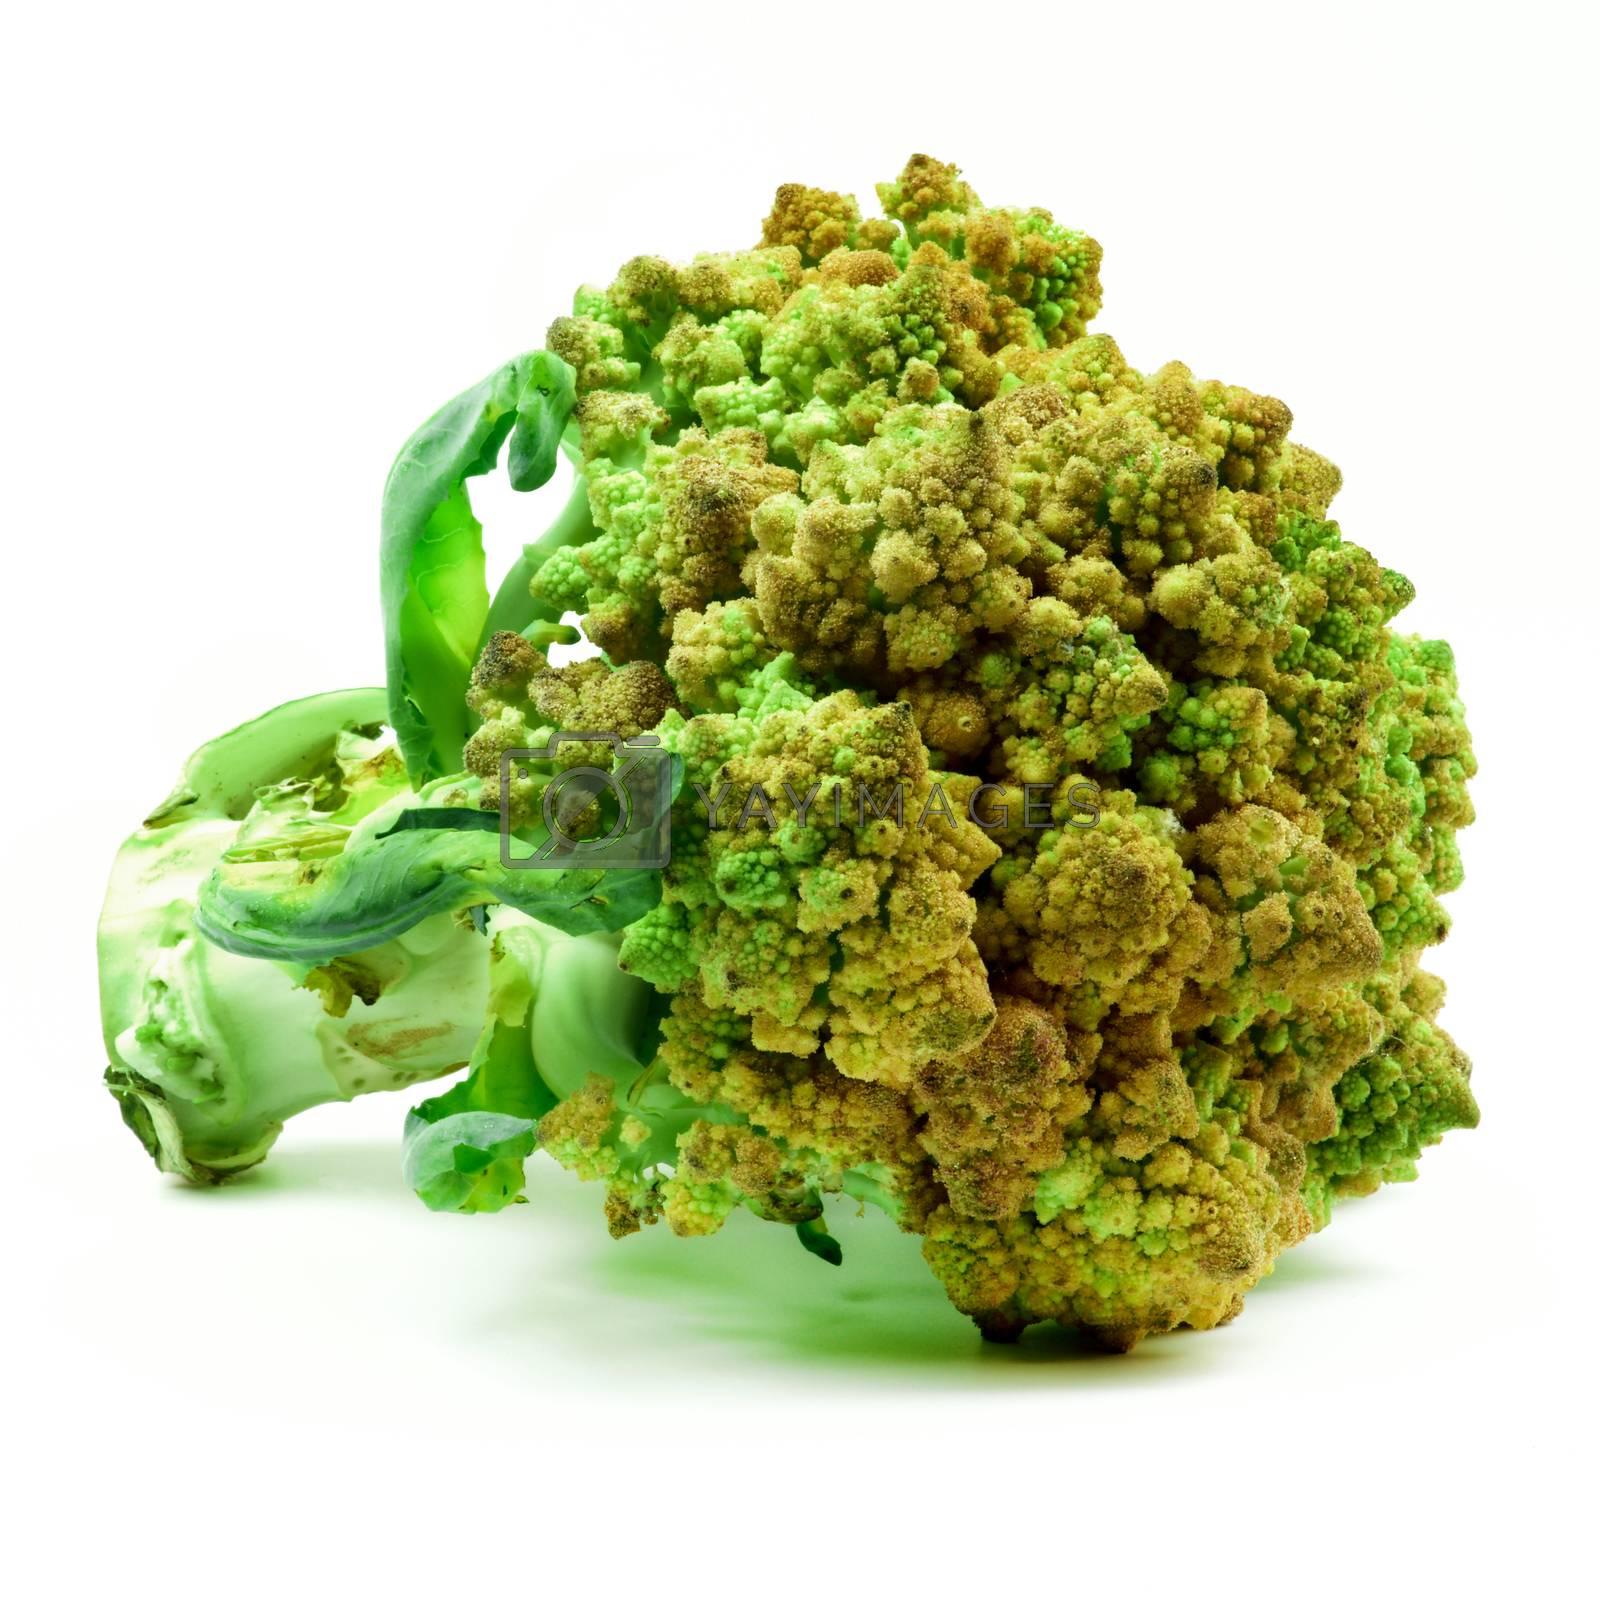 Perfect Raw Fresh Romanesco Broccoli with Leafs closeup on White background